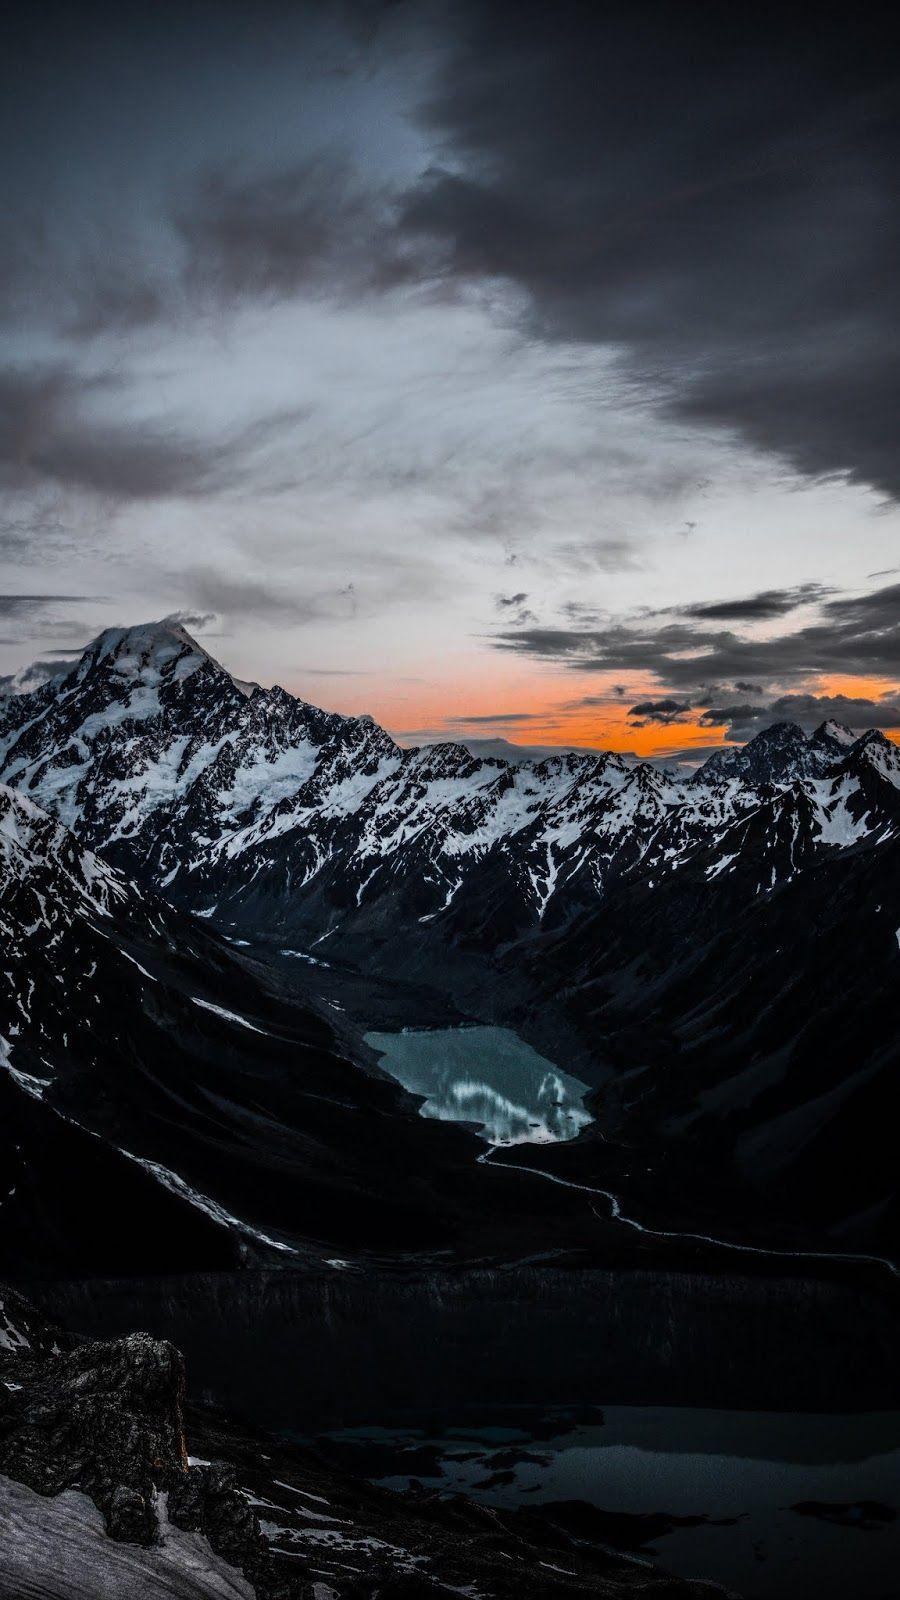 mountains, lake, tops, top view View wallpaper, Phone